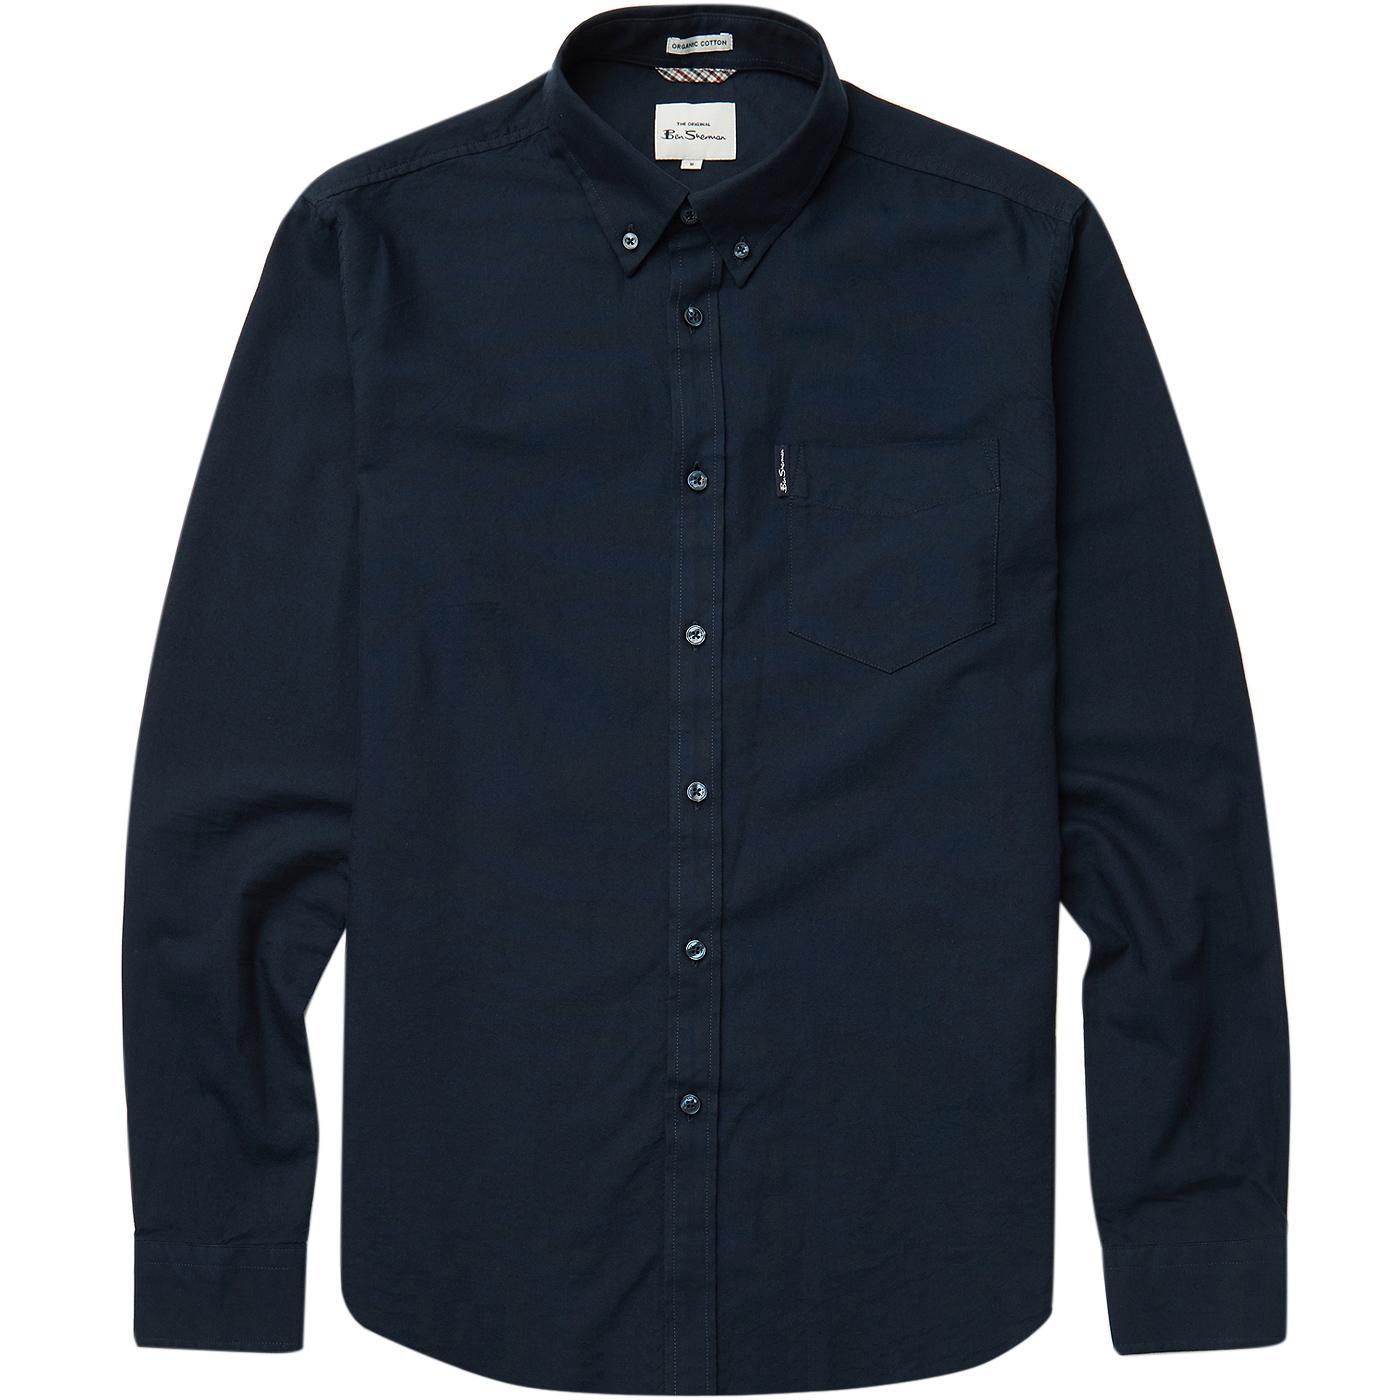 BEN SHERMAN Mod Organic Cotton Oxford shirt (Navy)